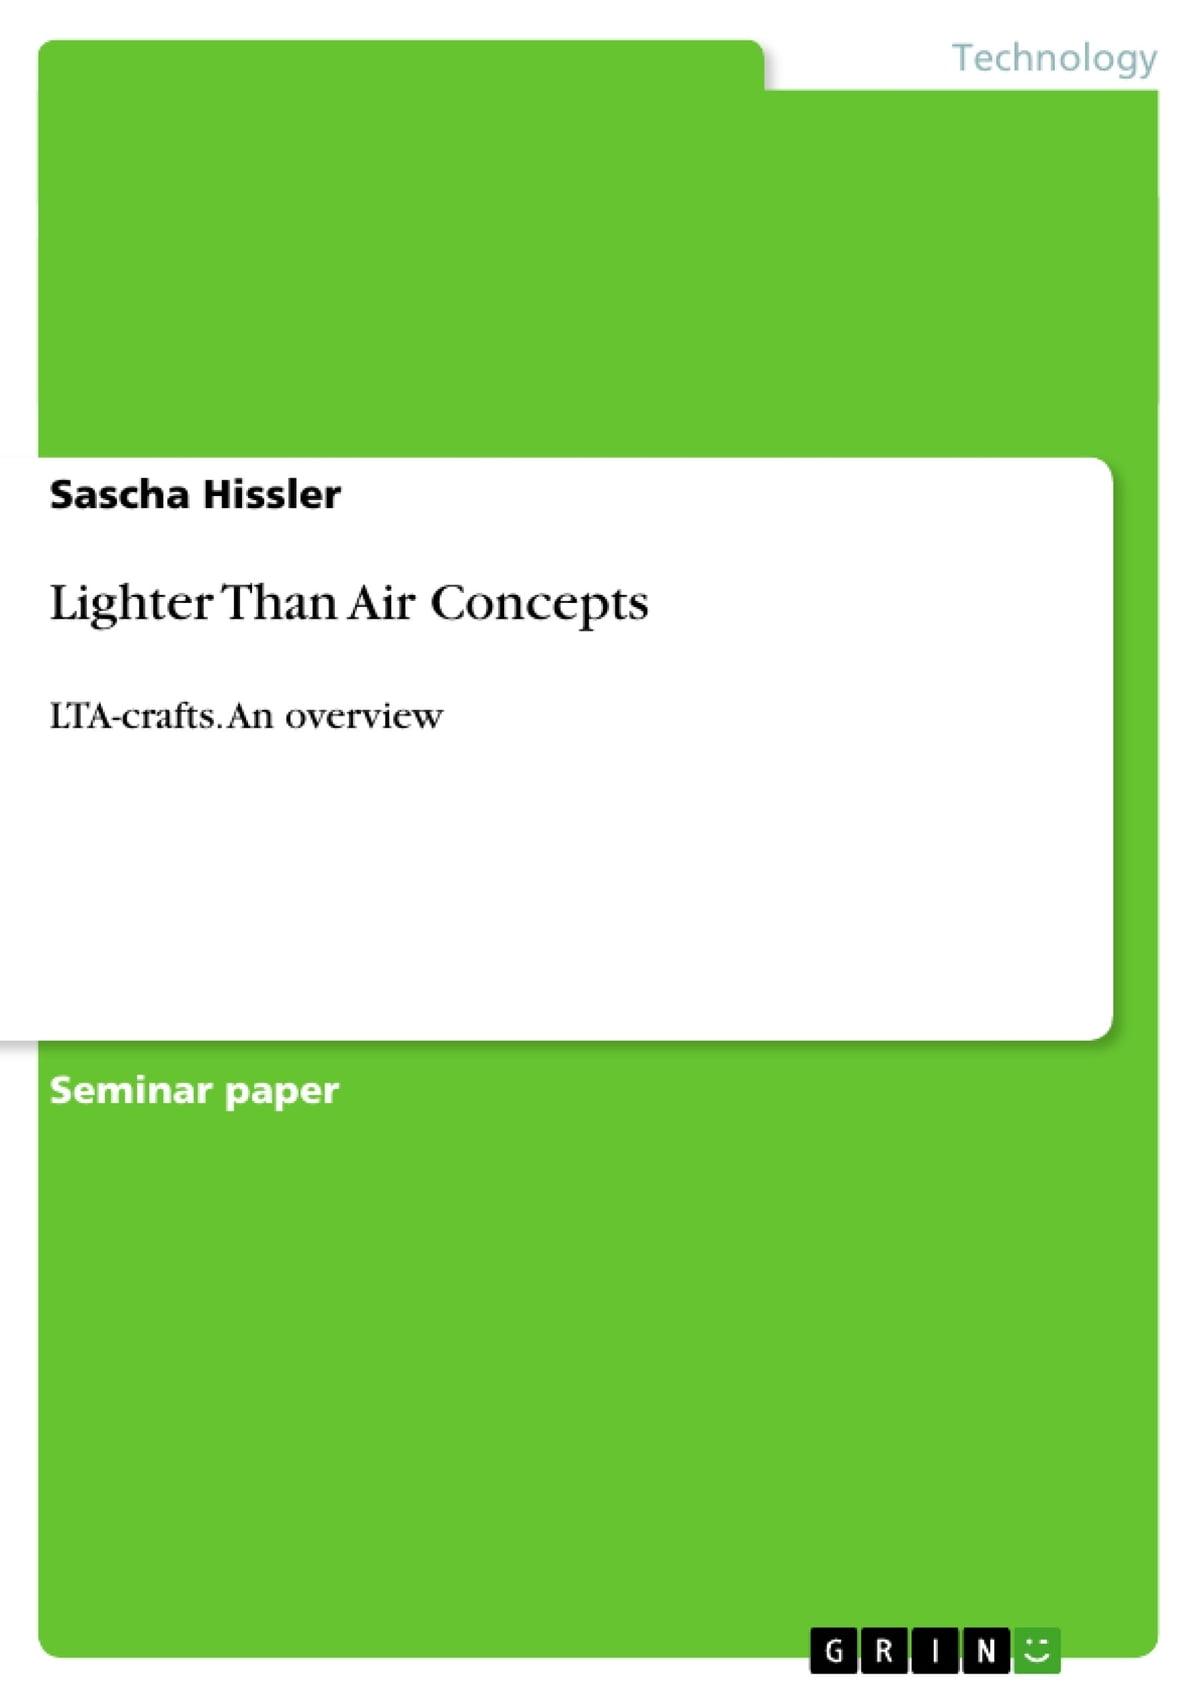 Lighter Than Air Concepts Ebook By Sascha Hissler